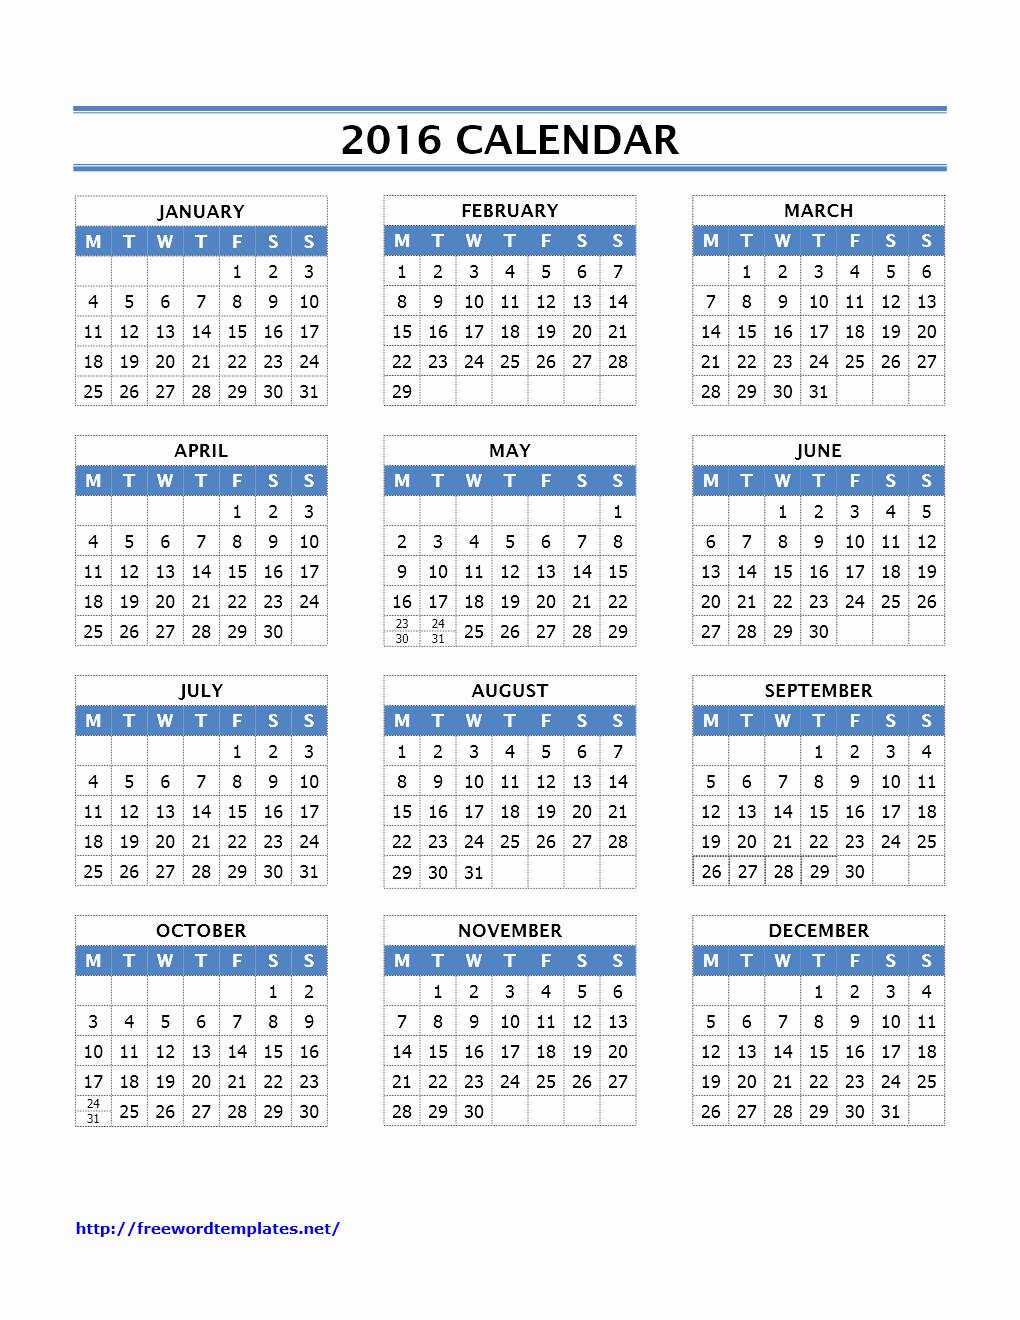 Free Year Calendar Template 2016 Awesome 2016 Calendar Templates